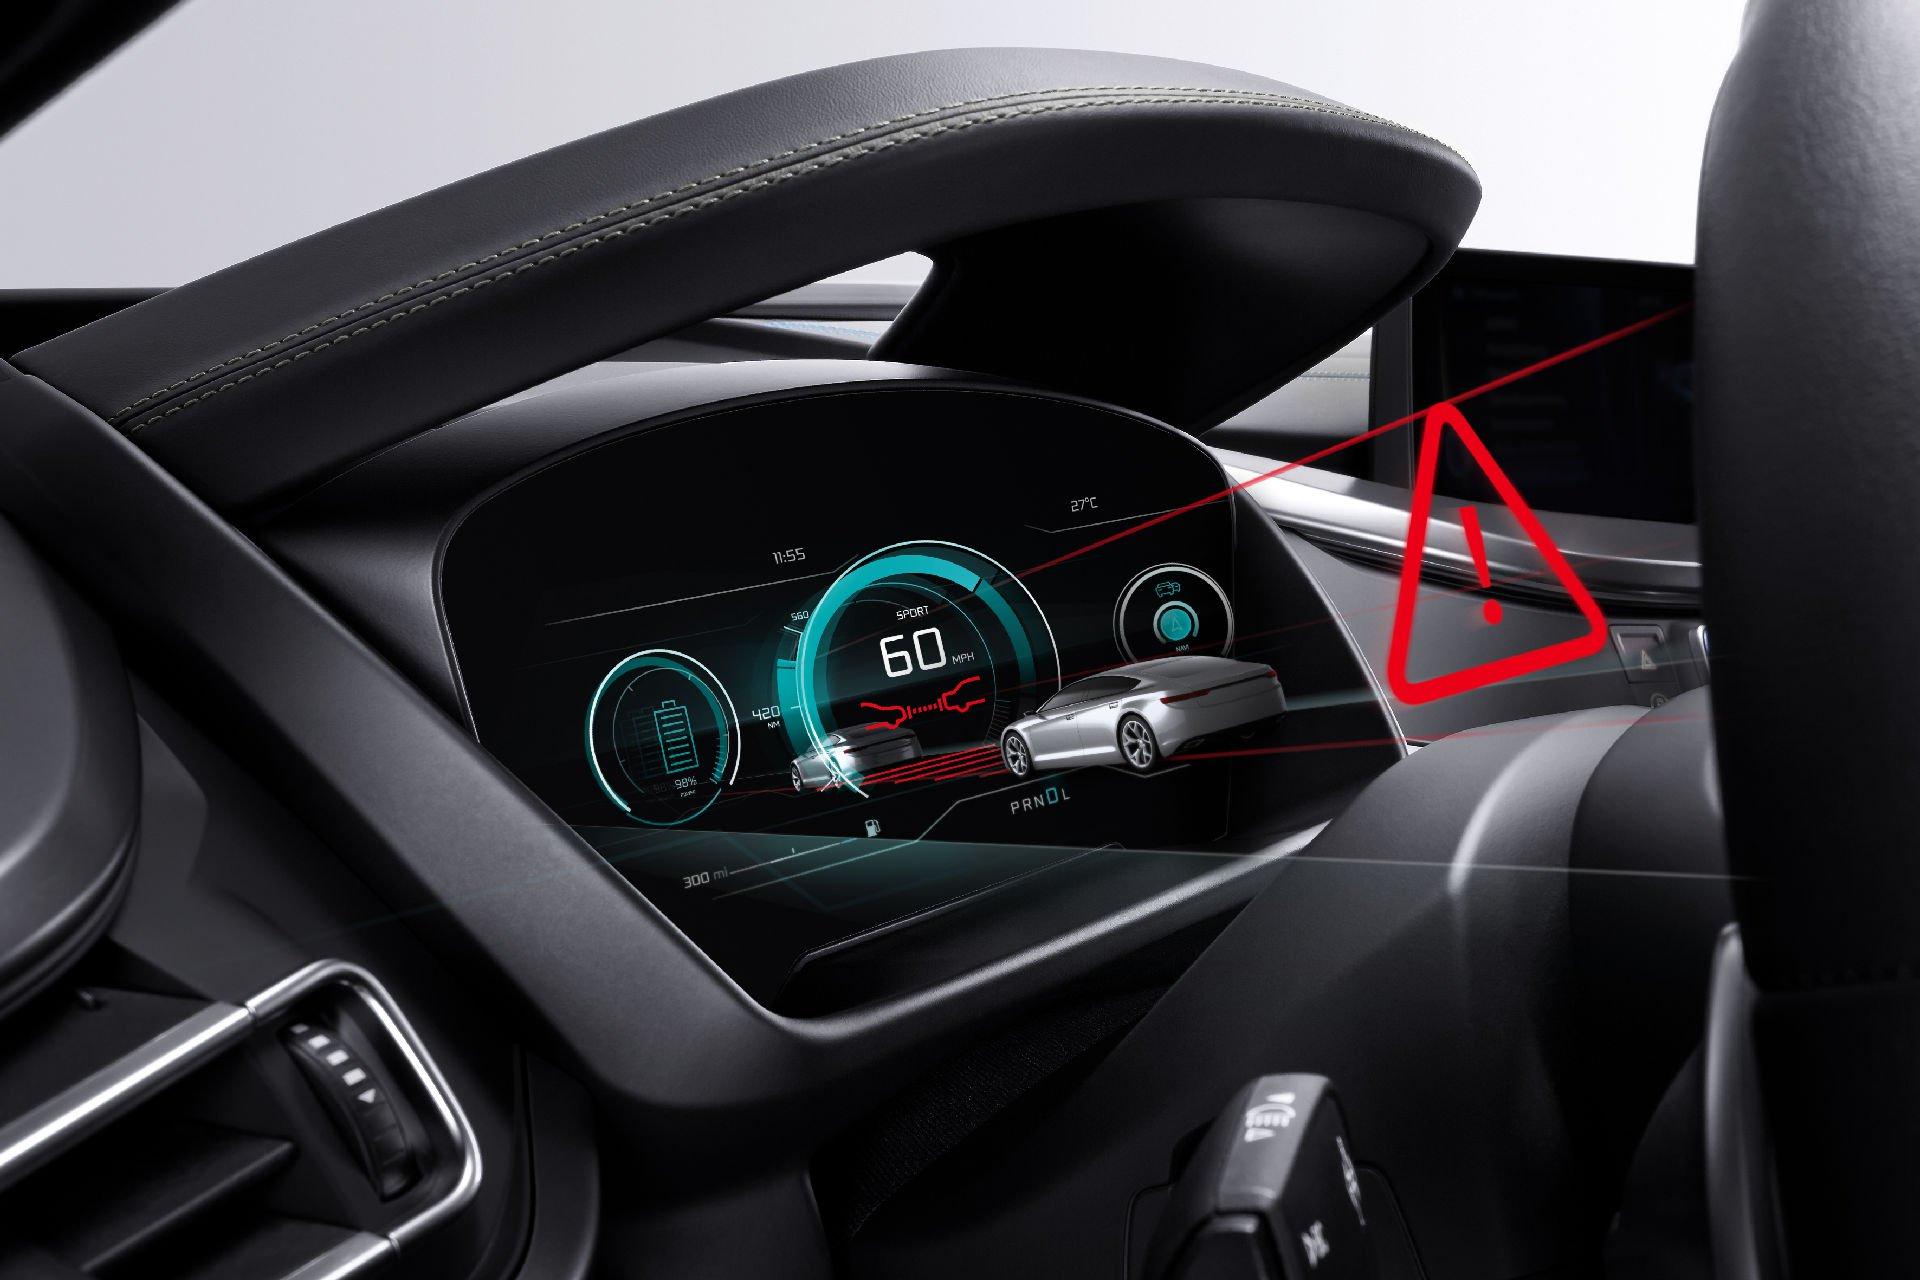 Bosch-3D-cockpit-display-3